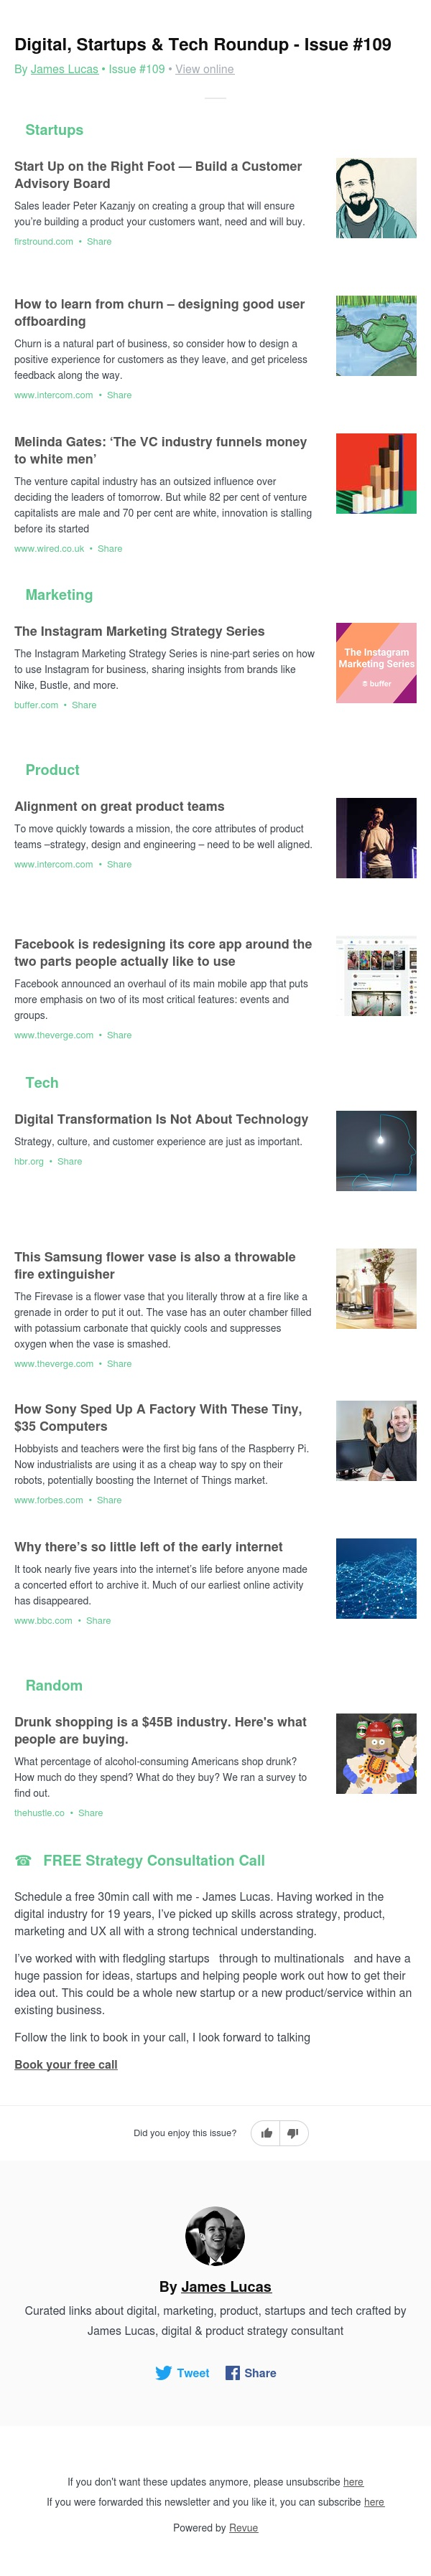 Digital, Startups & Tech Roundup - Issue #109